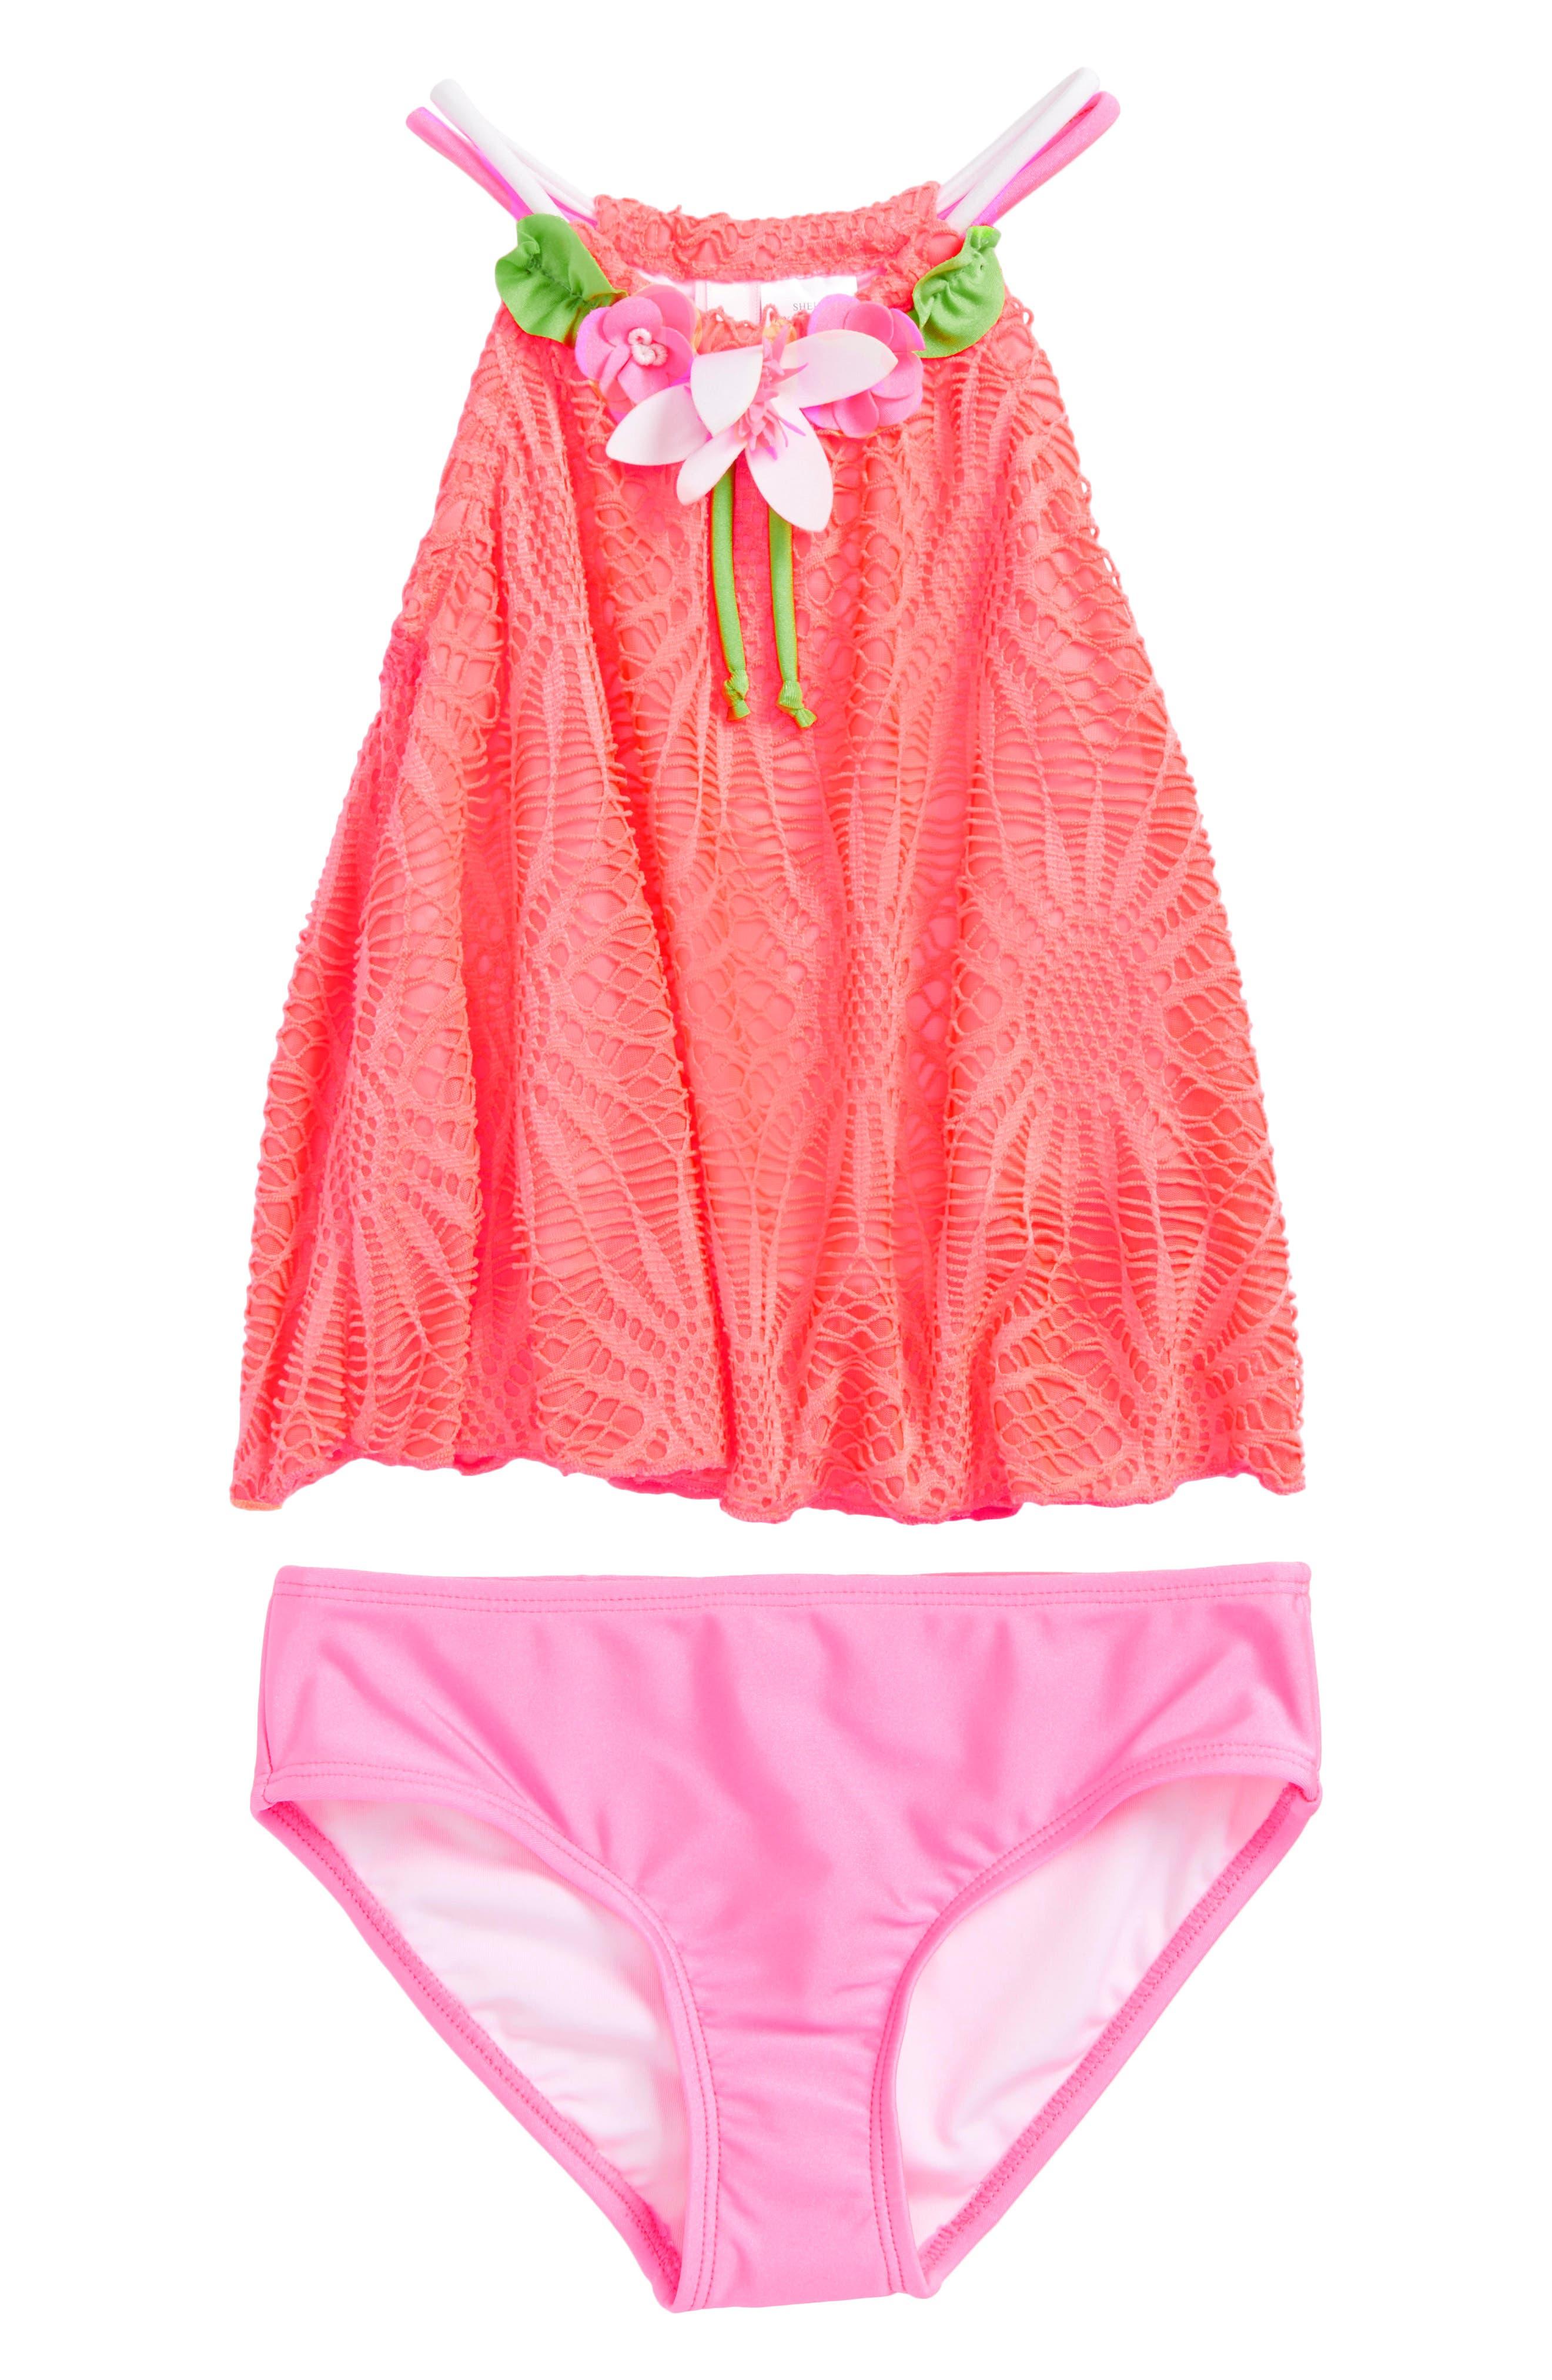 Crochet Tankini Two-Piece Swimsuit,                         Main,                         color, 950